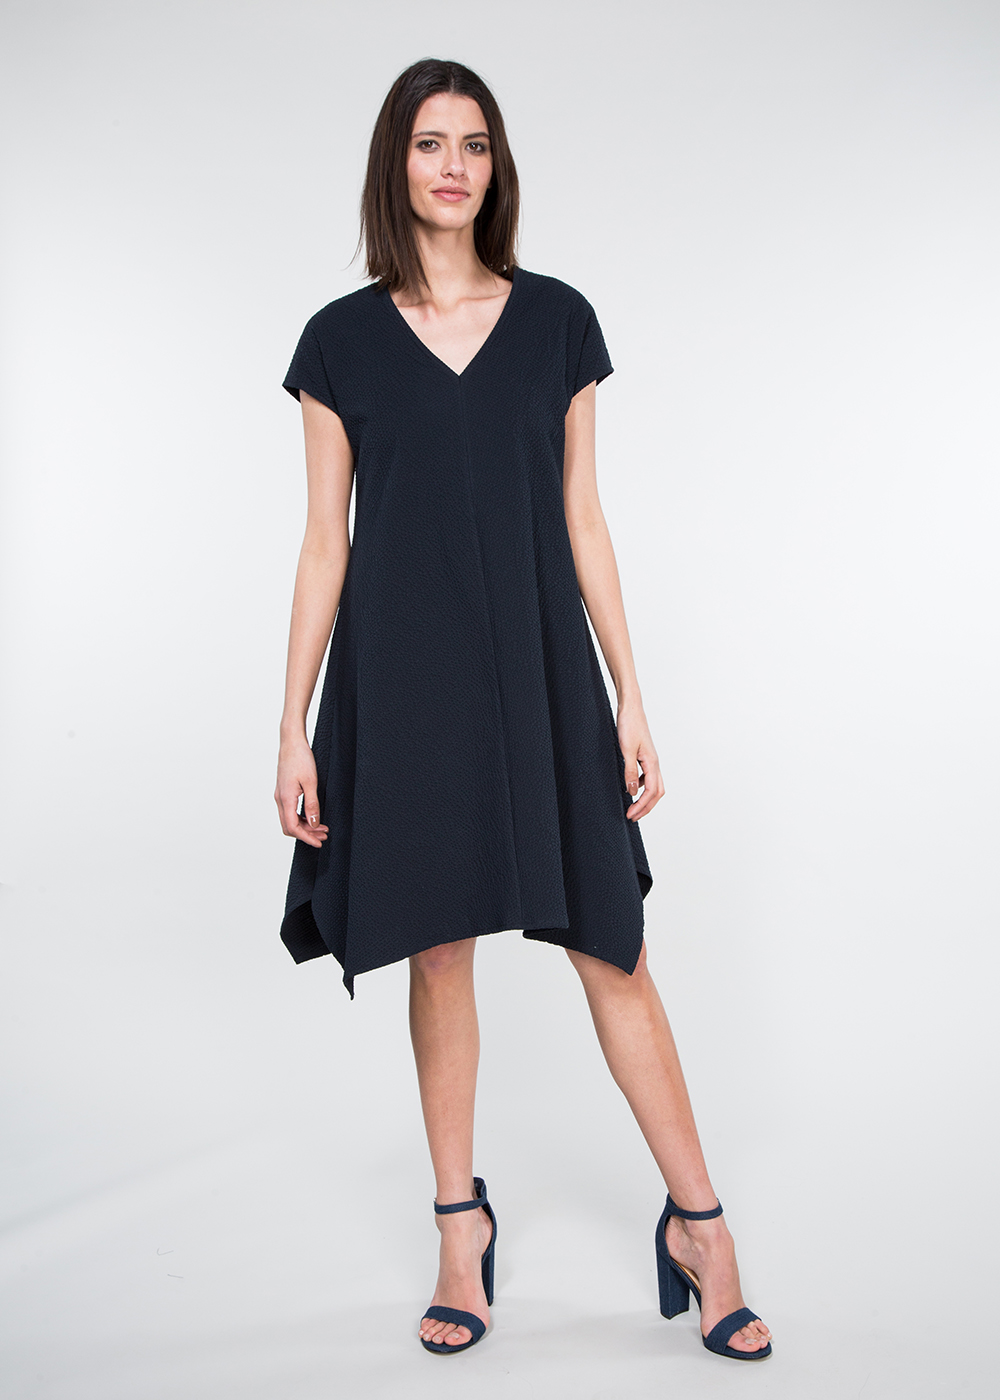 Westwood Dress in Italian Black Cotton Seersucker  $895